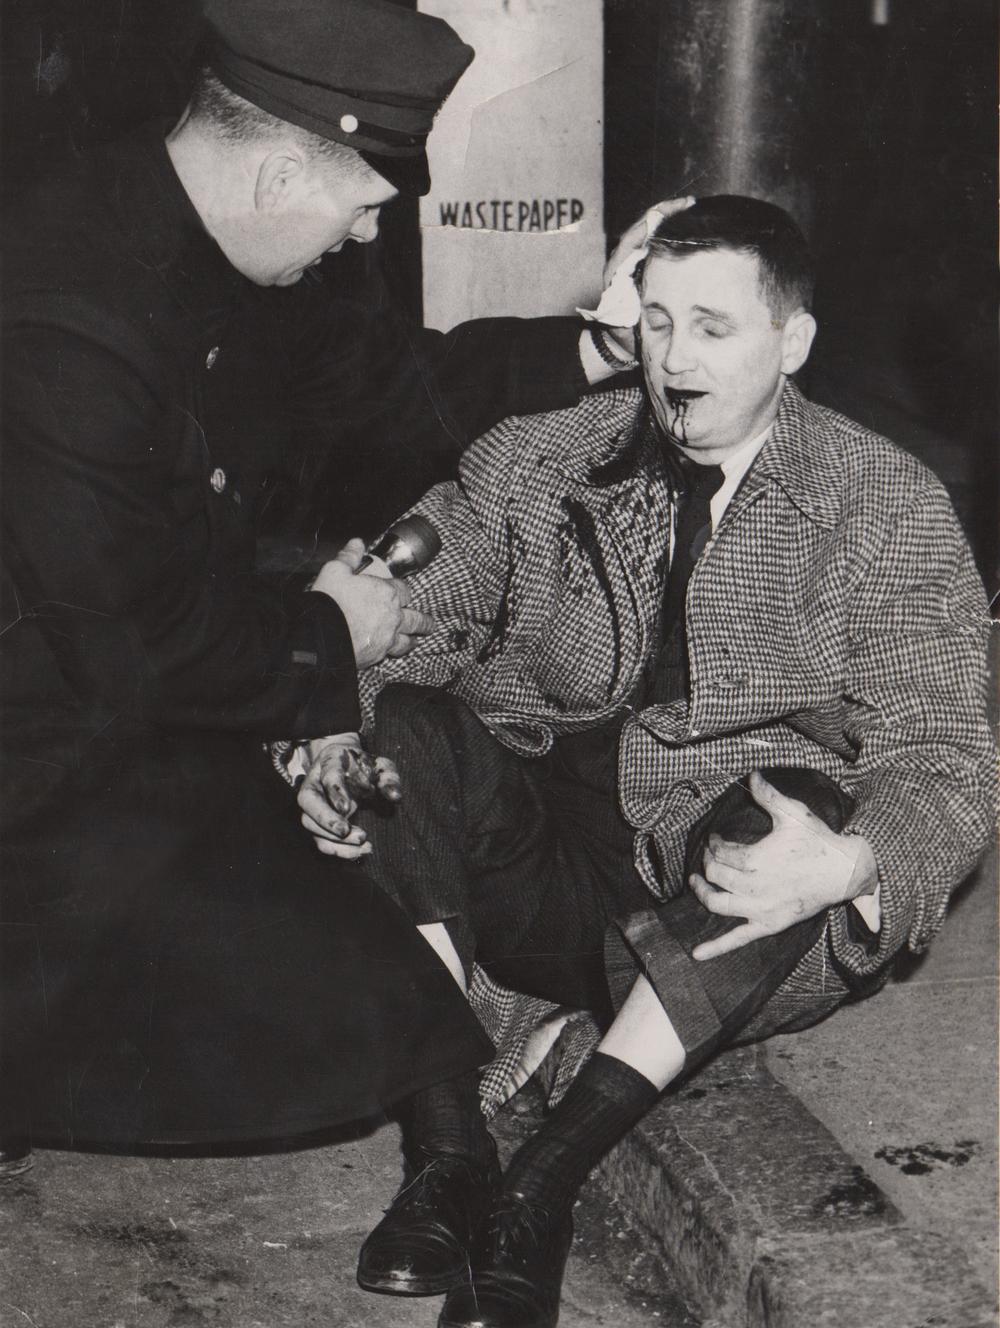 Assisting an assault victim